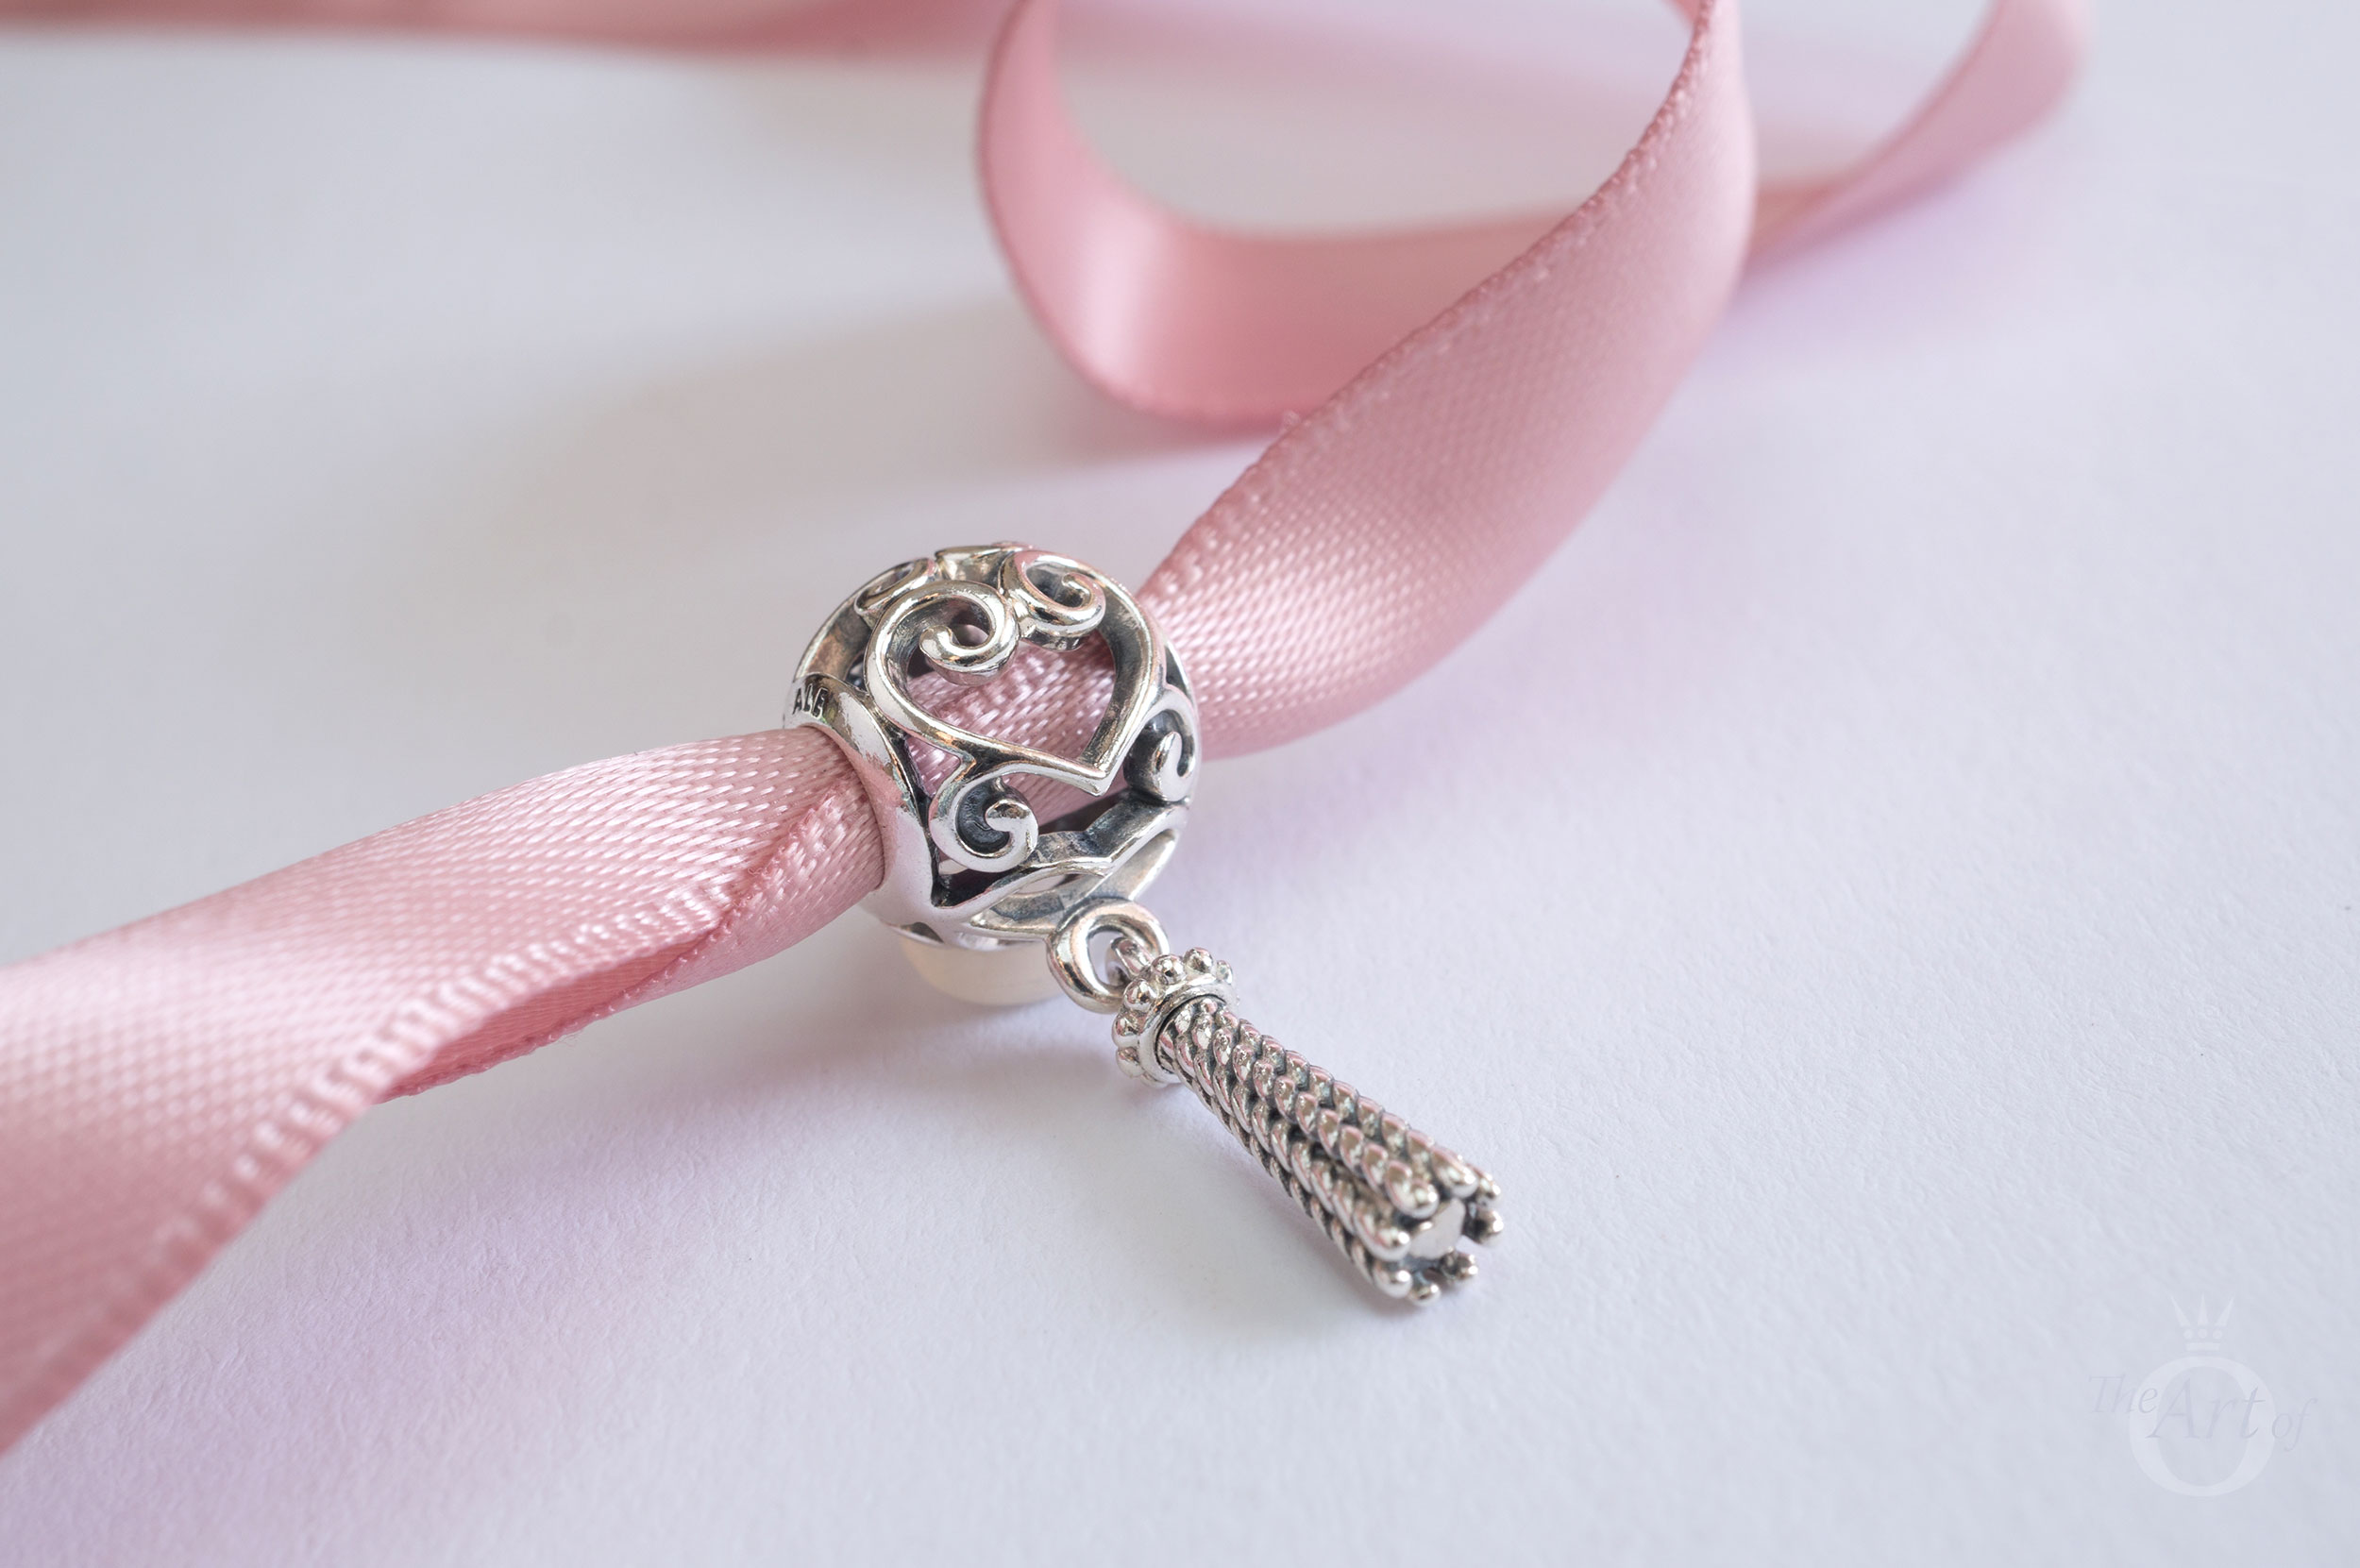 0a5cce464 797037-PANDORA-Enchanted-Heart-Tassel-8l - The Art of Pandora   More ...